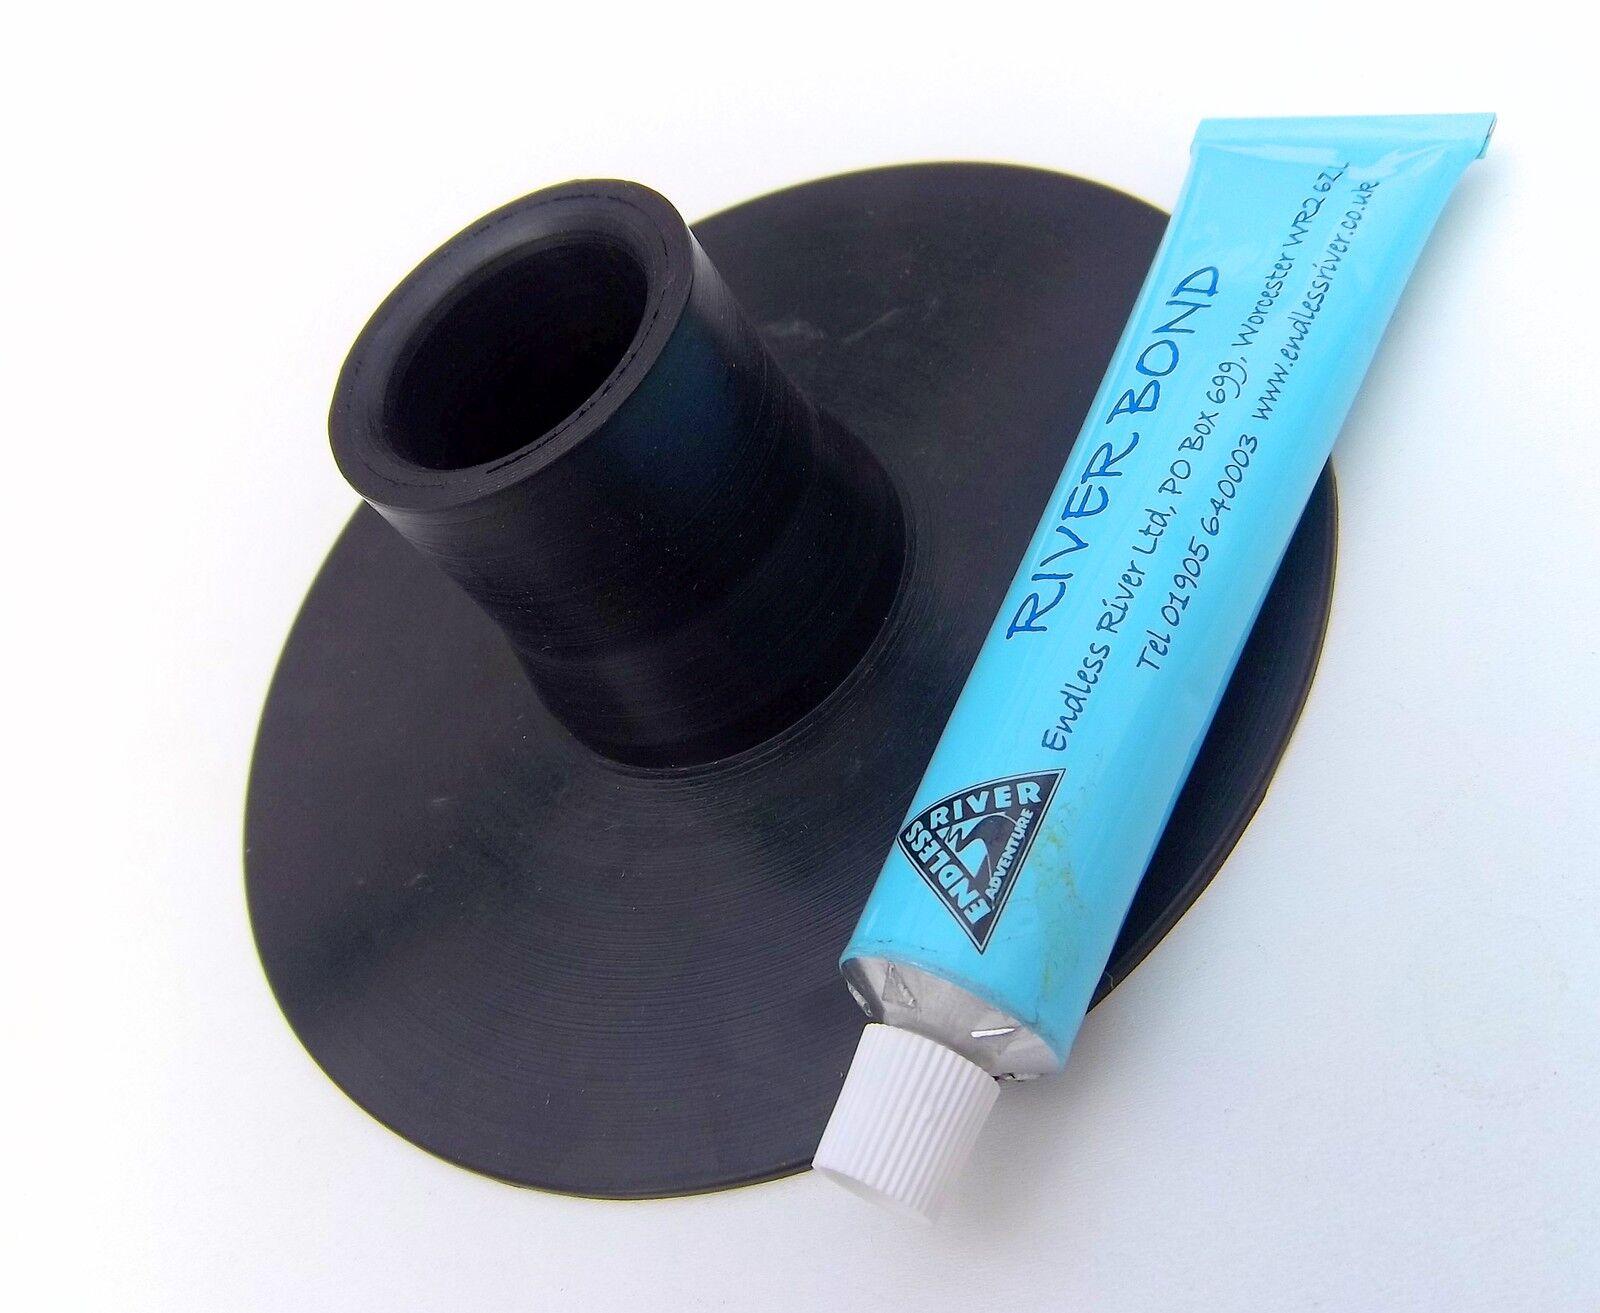 Canoe Solo Sailing Rubber Mast Foot + Glue  ENDLESS RIVER Mast Step